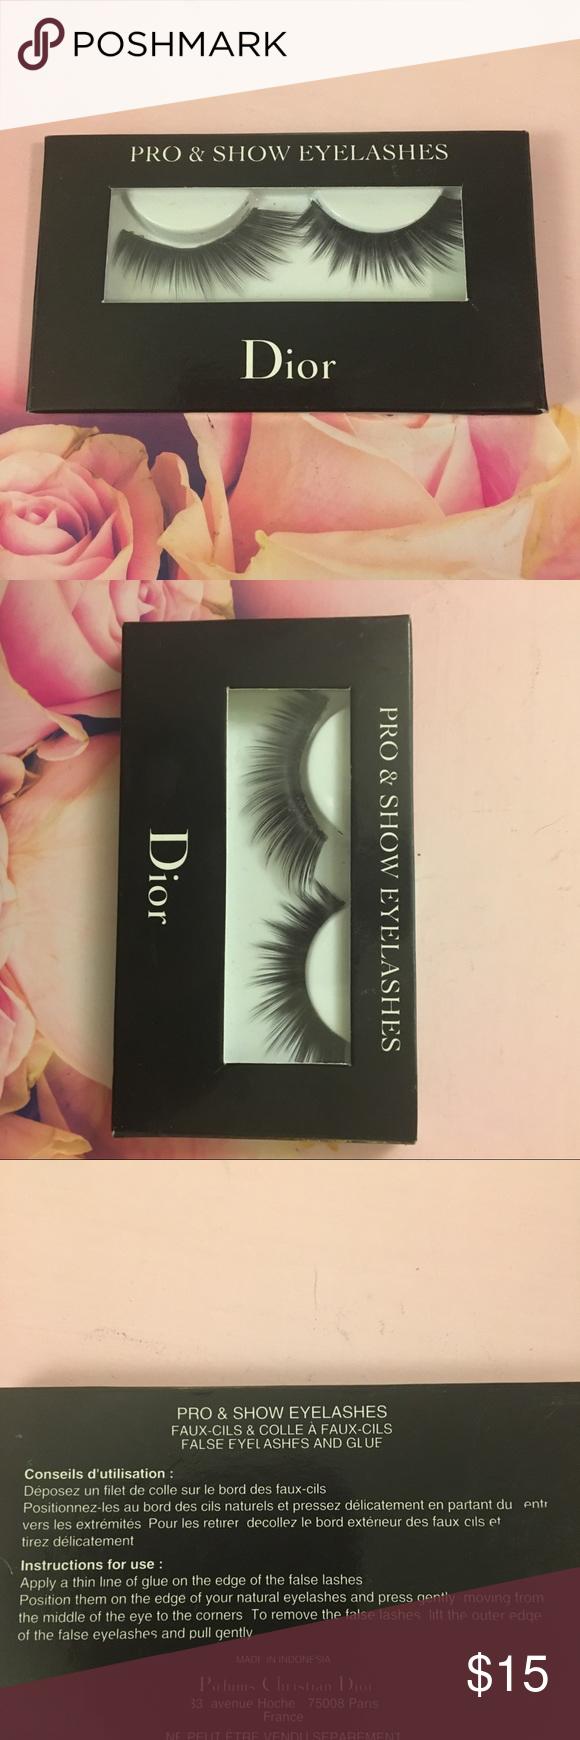 Dior Eyelashes Nwt In 2018 My Posh Picks Pinterest Dior Makeup